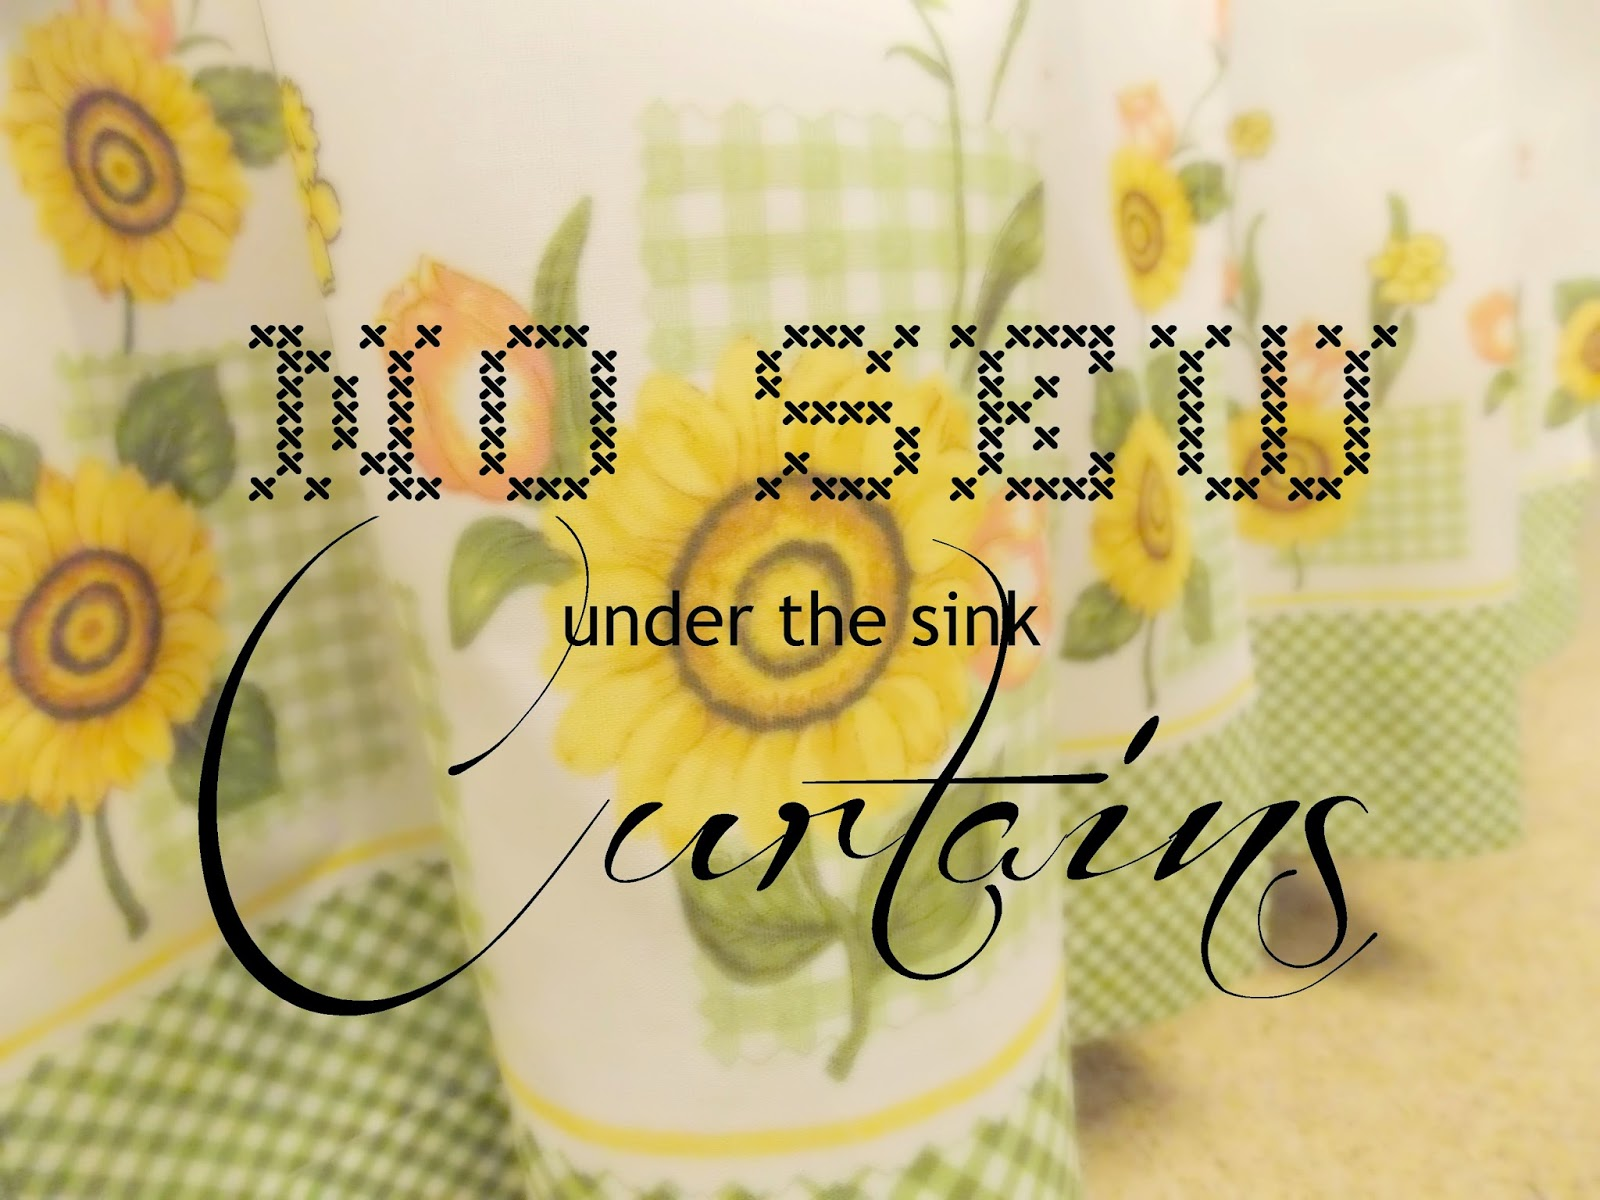 http://northshorebungalow.blogspot.com/2014/07/no-sew-under-sink-curtains.html